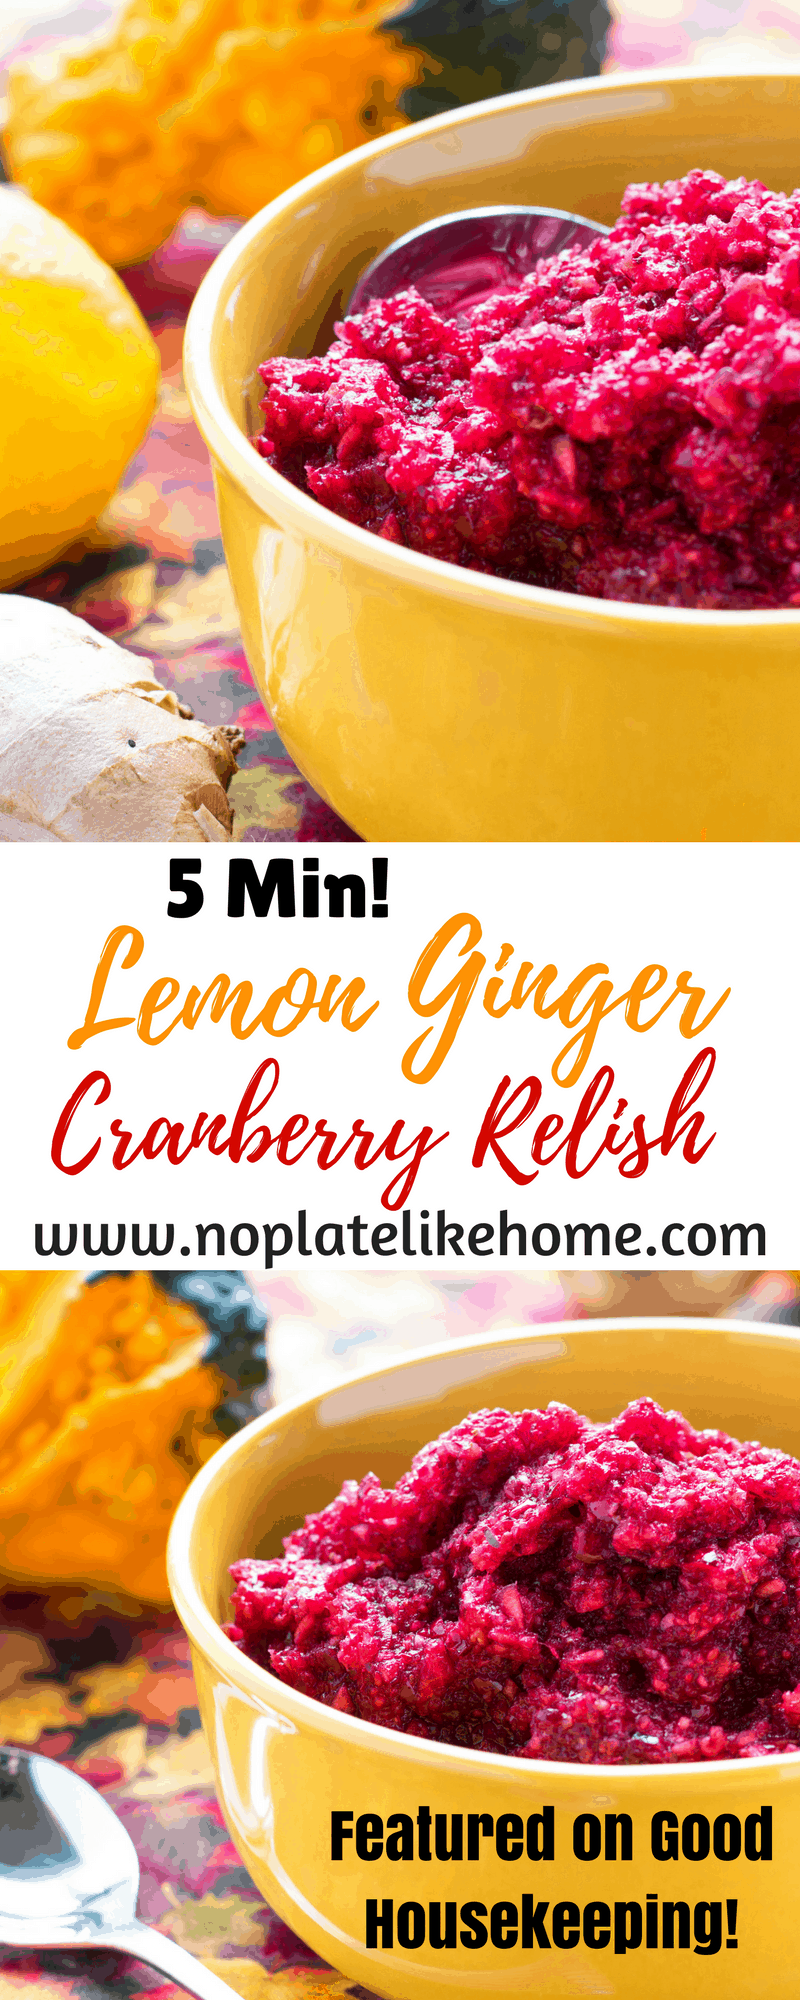 Lemon Ginger Cranberry Relish